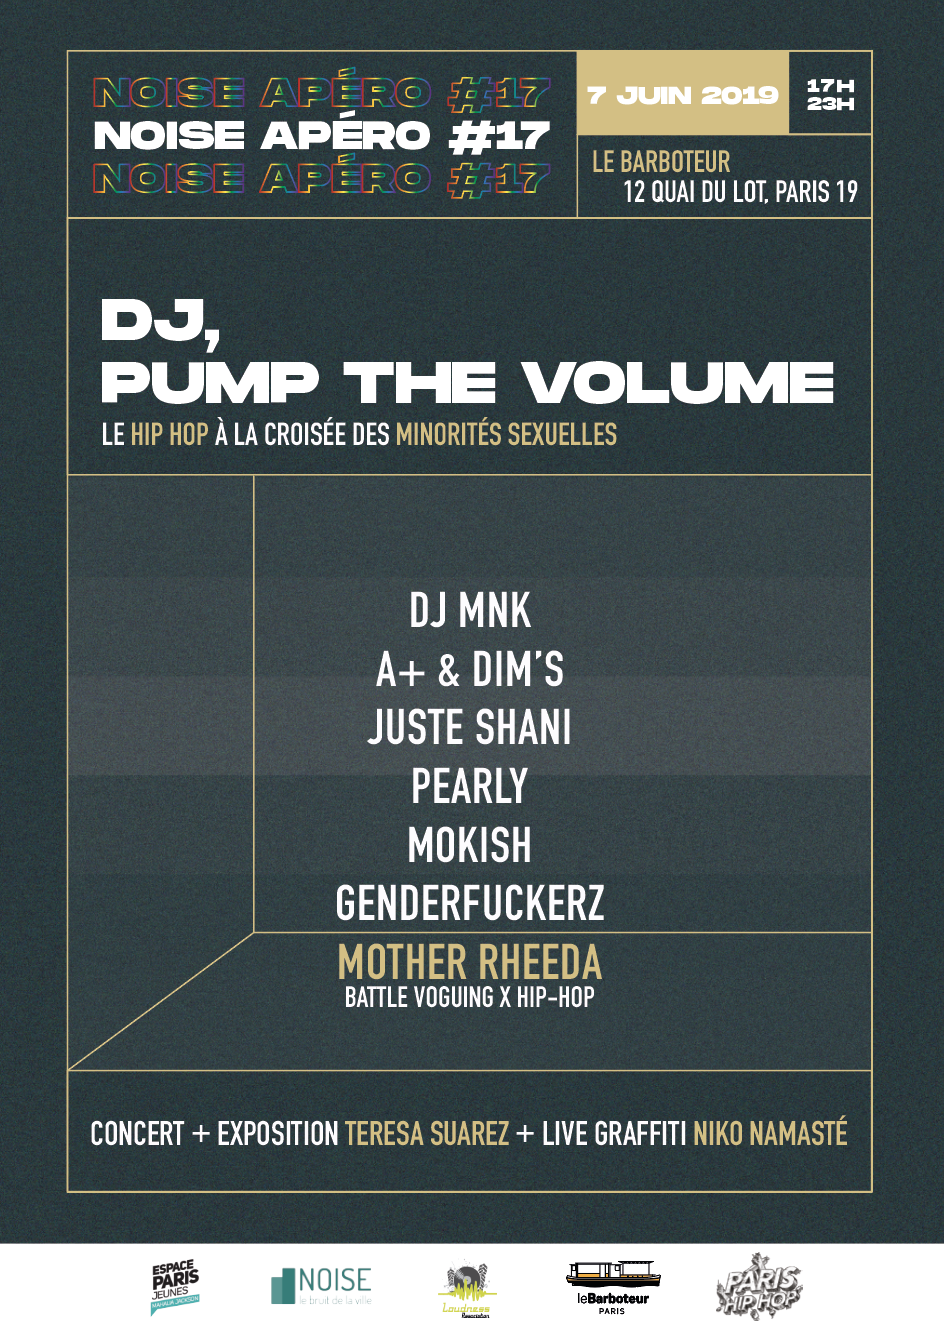 DJ Pump The Volume